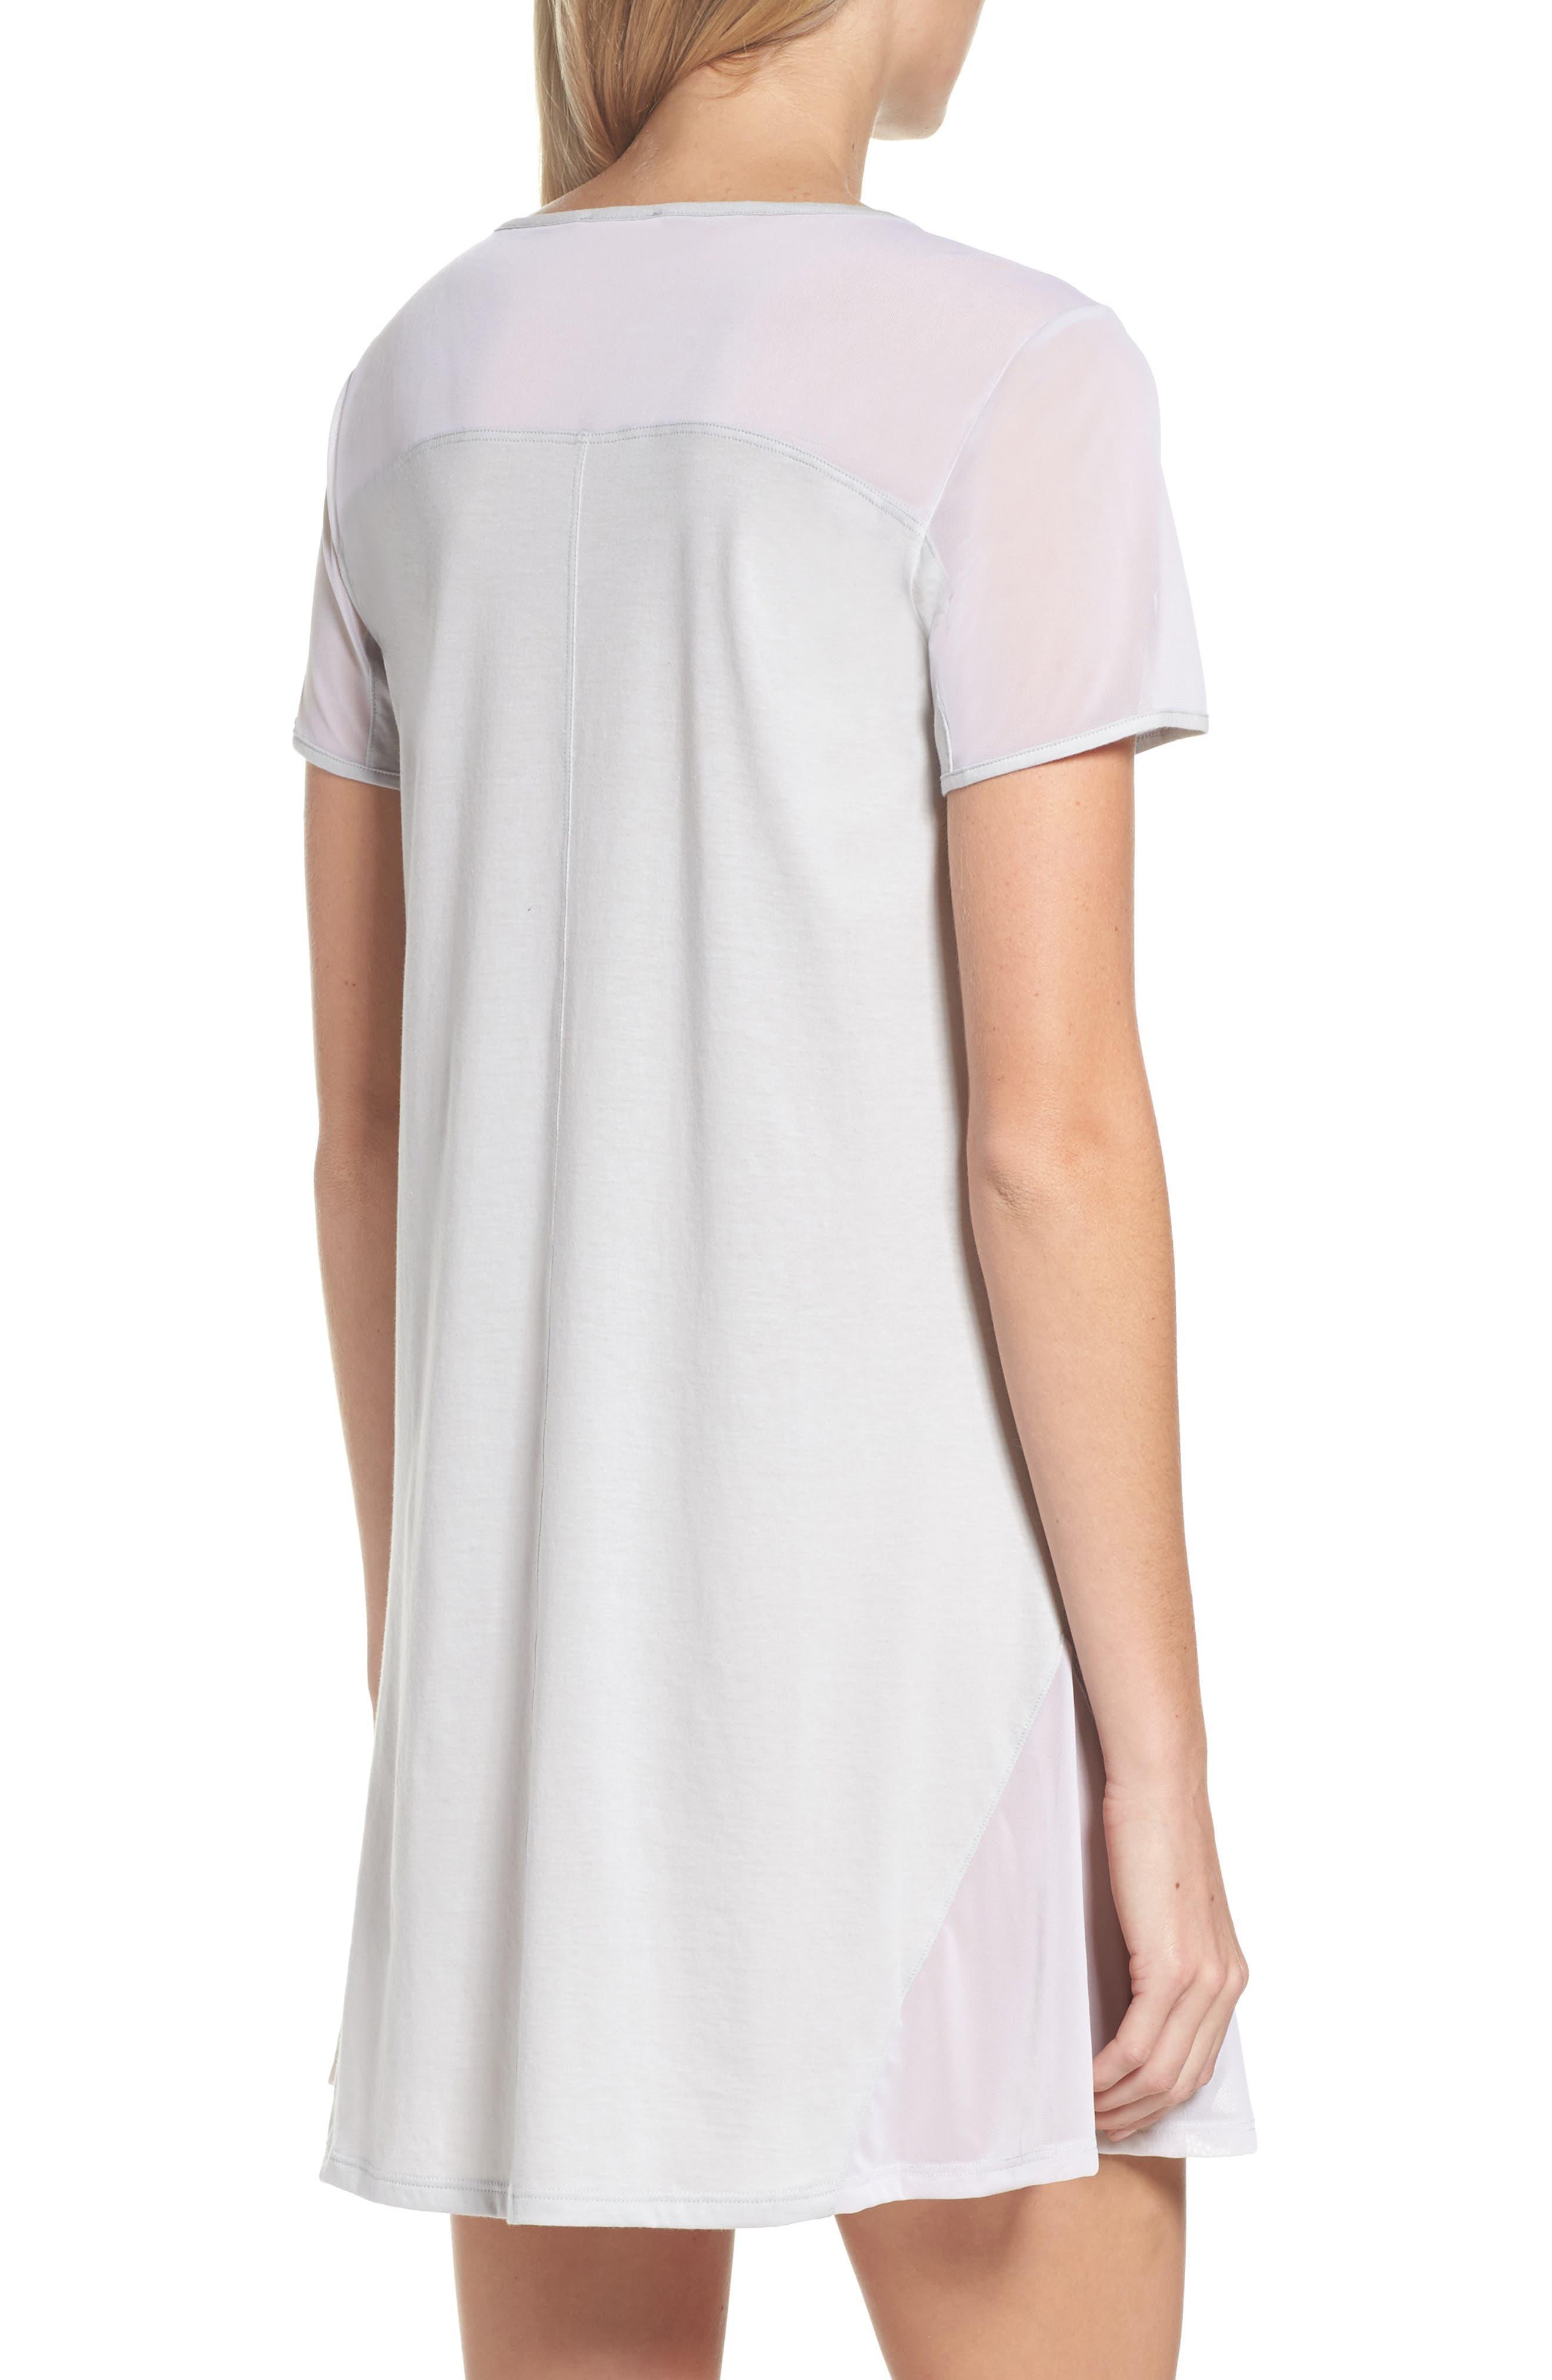 Cotton Sleep Shirt,                             Alternate thumbnail 2, color,                             SOFT GRAY